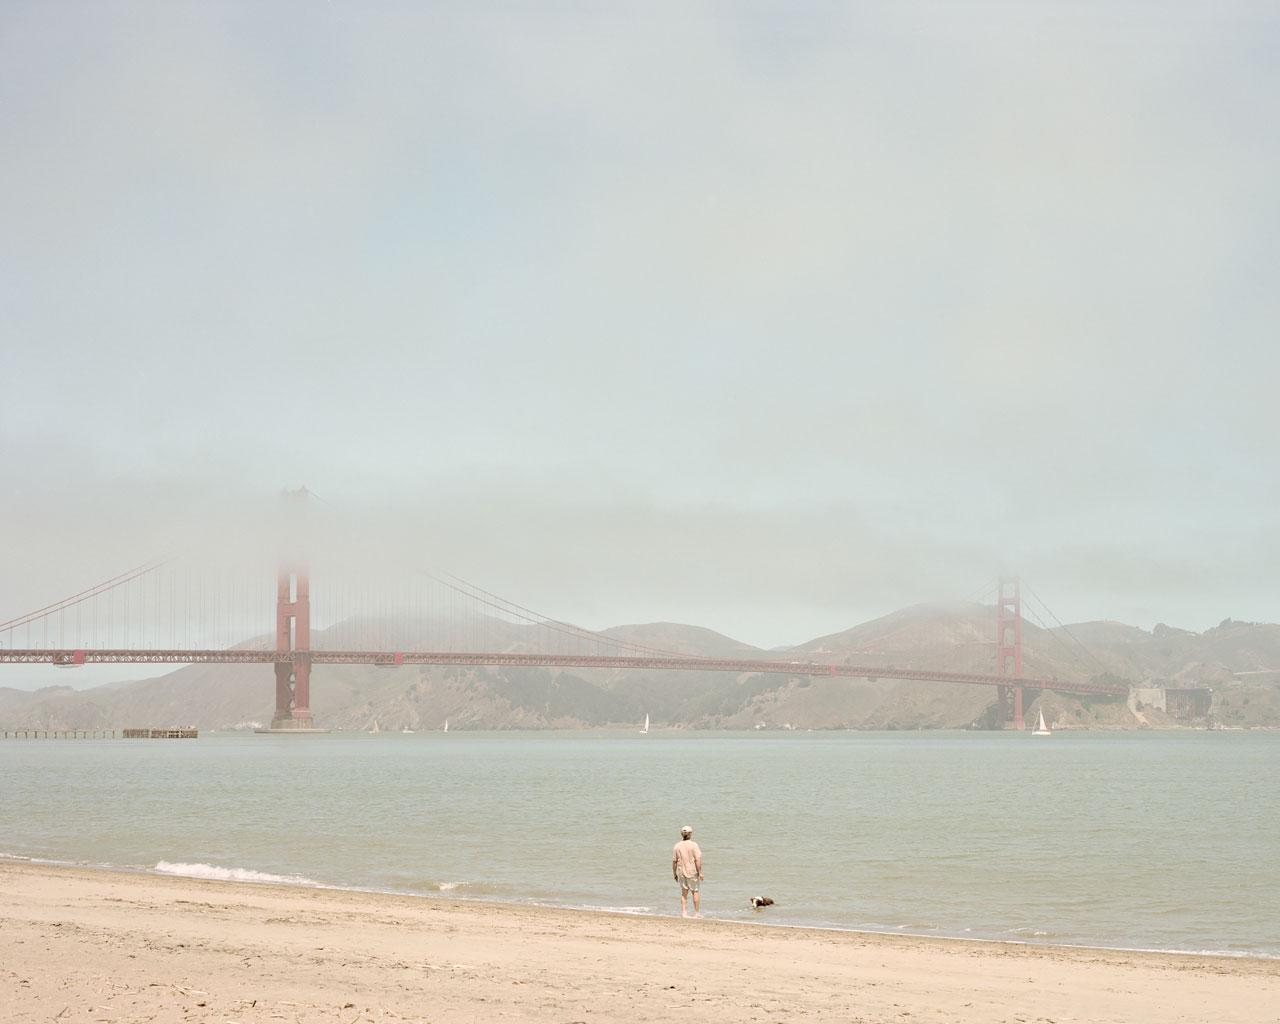 Walking the dog, San Francisco, CA, USA - Photo by Ákos Major